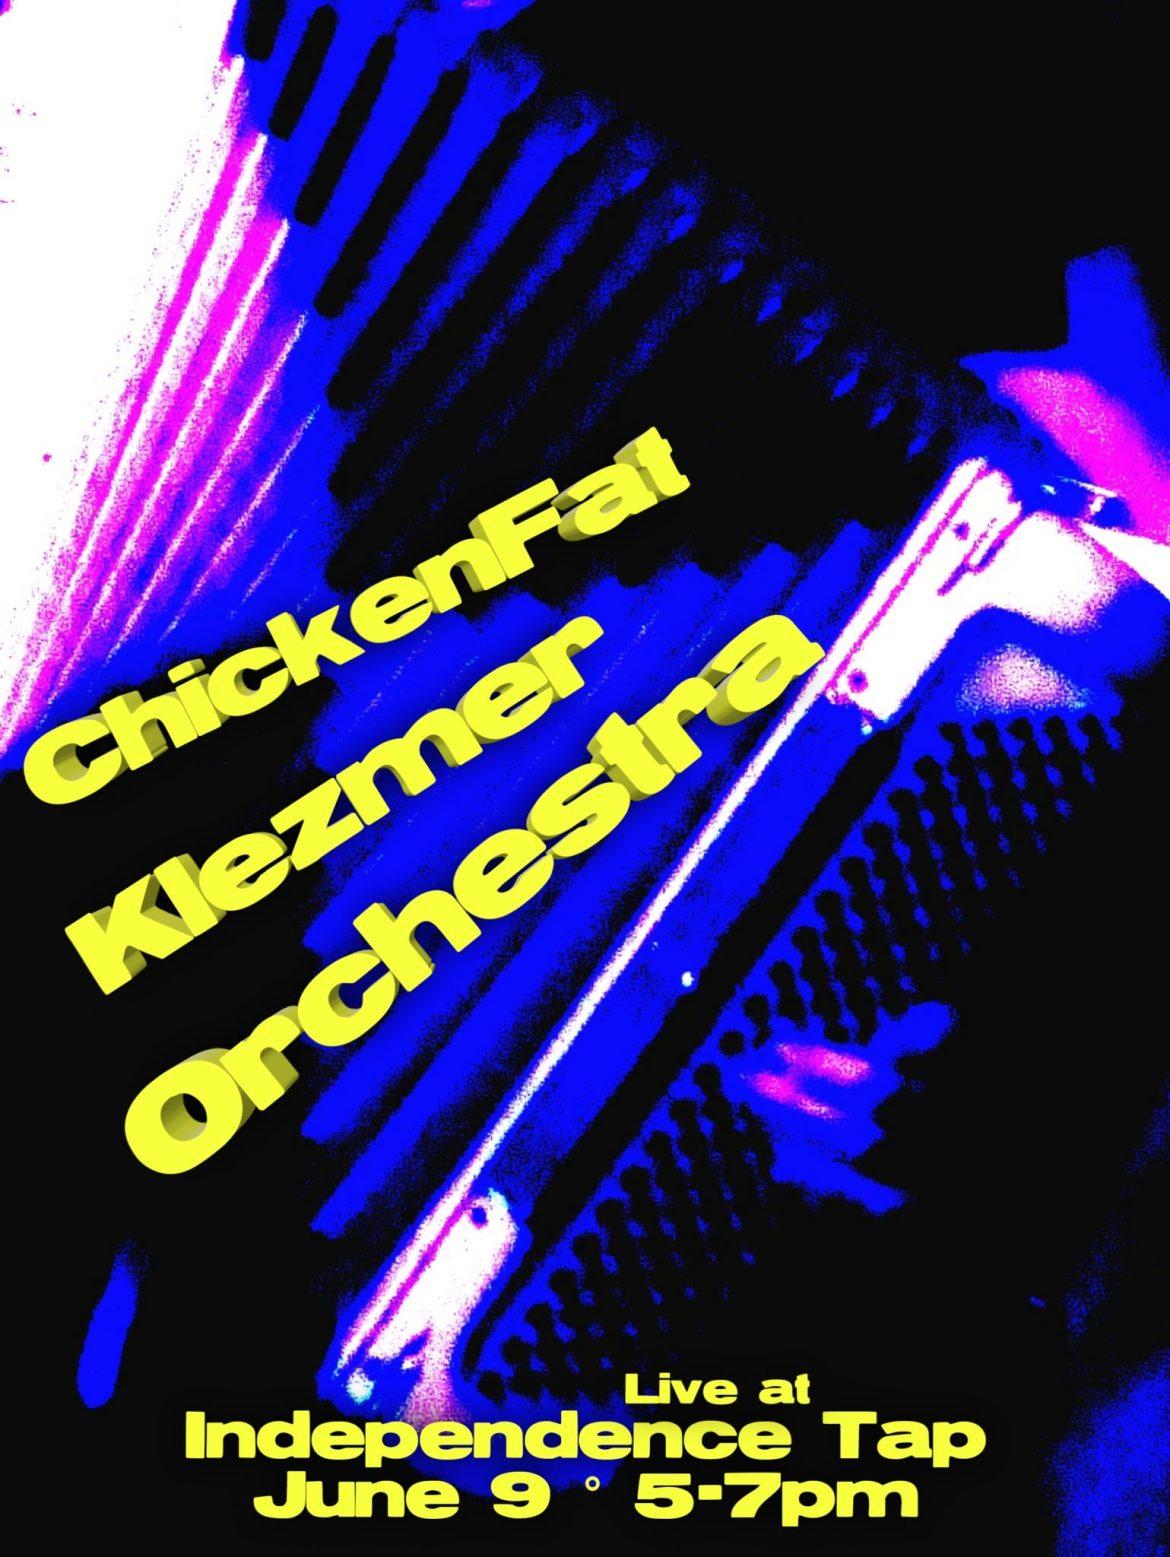 ChickenFat Klezmer Orchestra at Independence Tap June 9, 2019